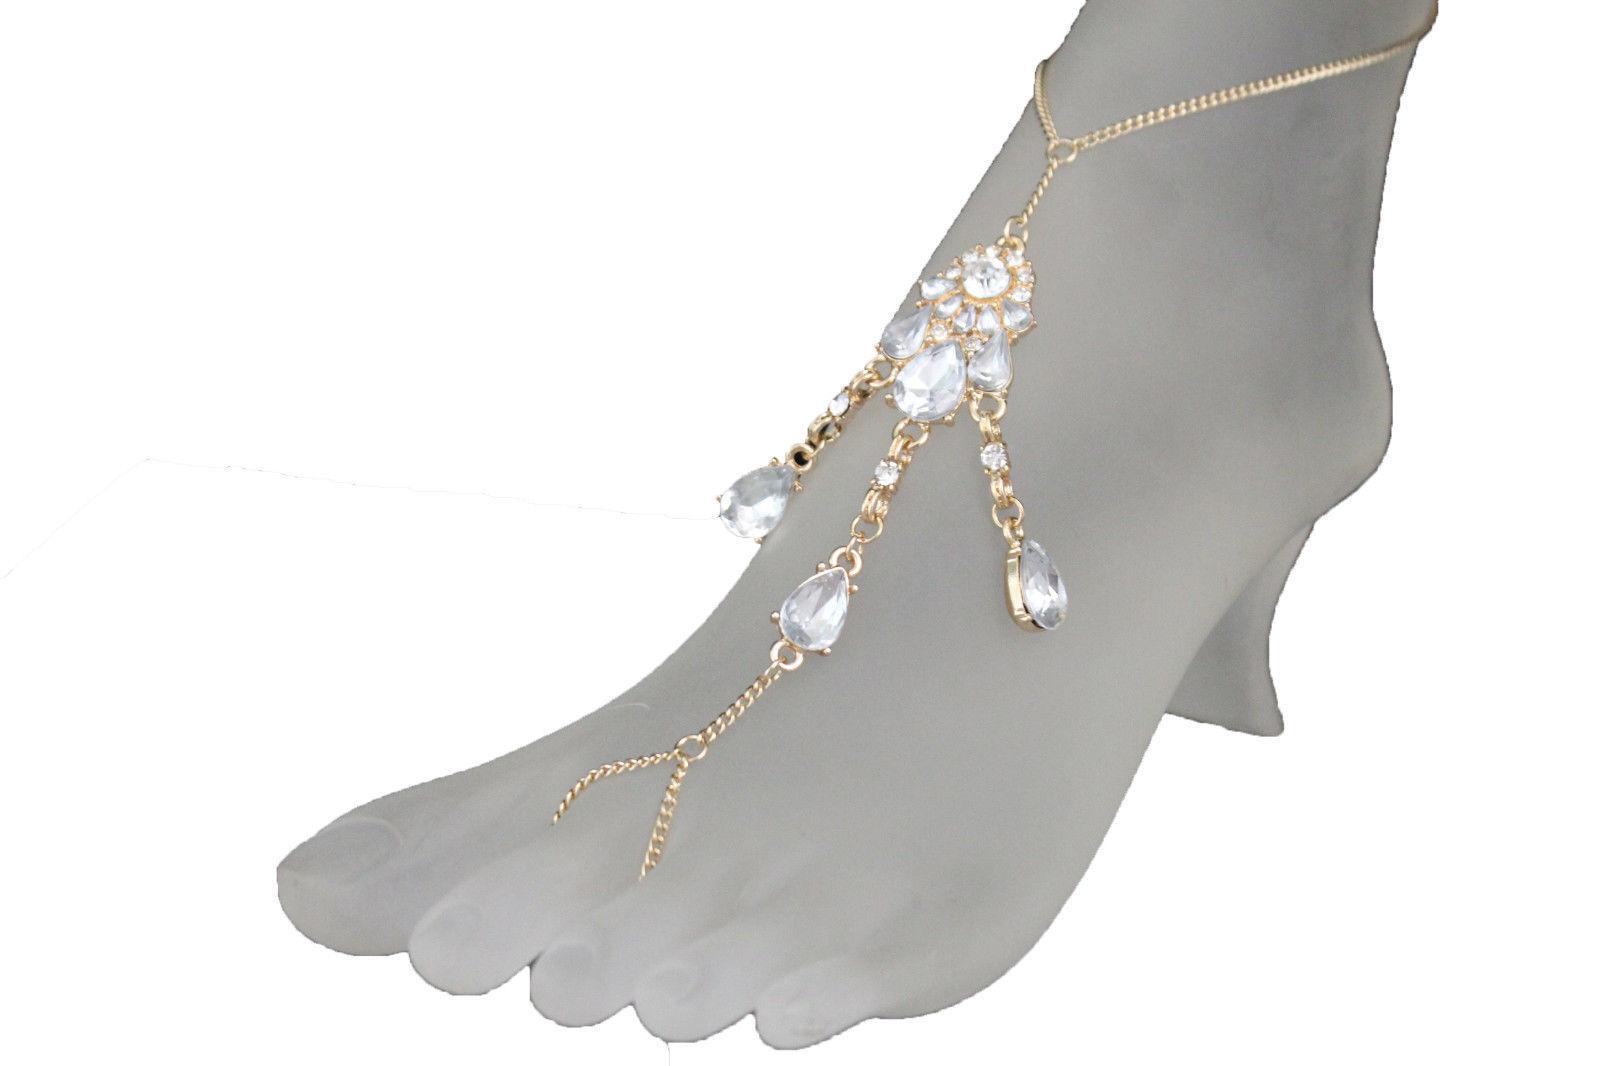 Women Foot Bracelet Metal Chains Gold Anklet Ethnic Bling Charm Silver Stones